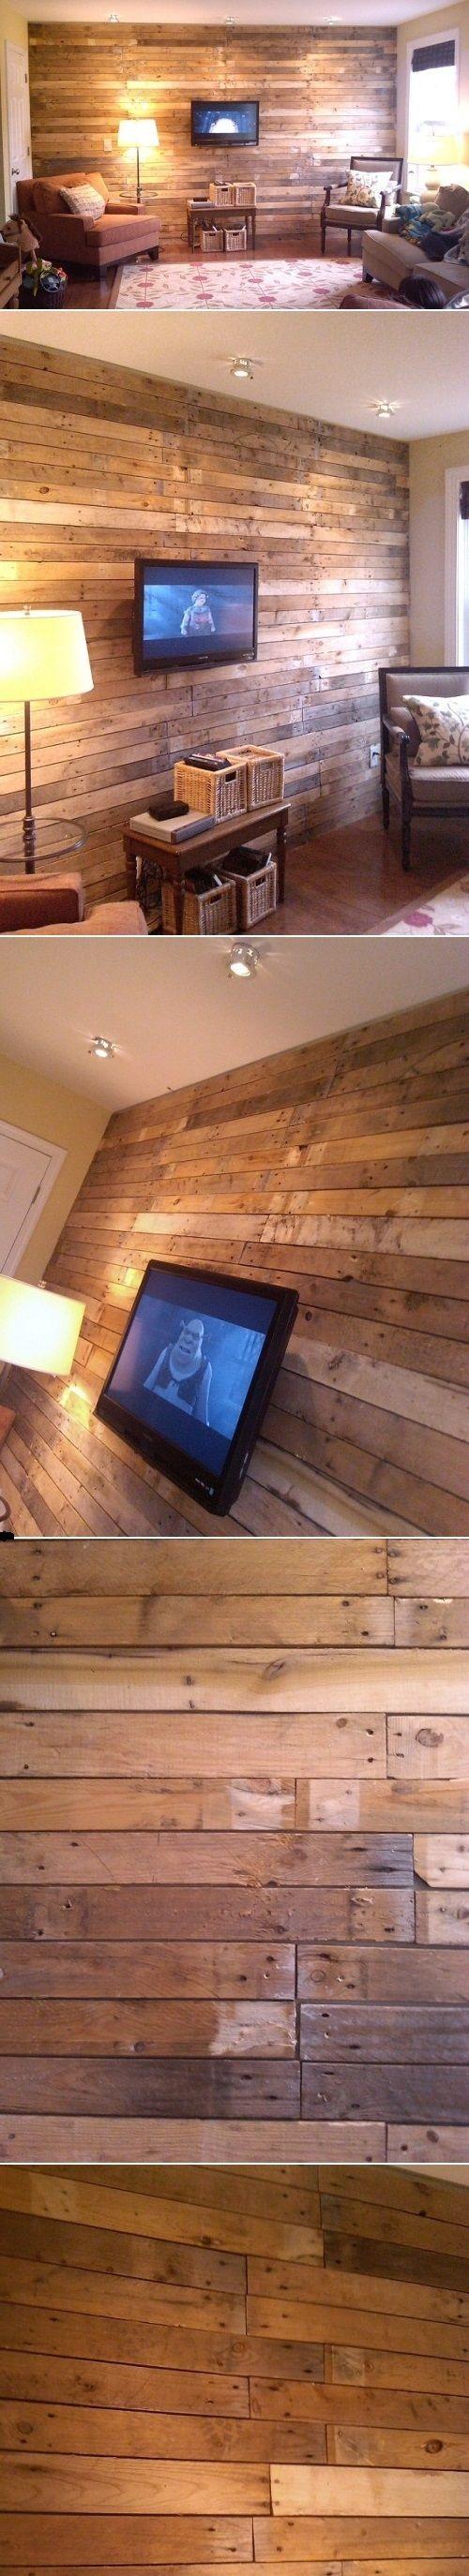 DIY Wood Pallet Wall ideas